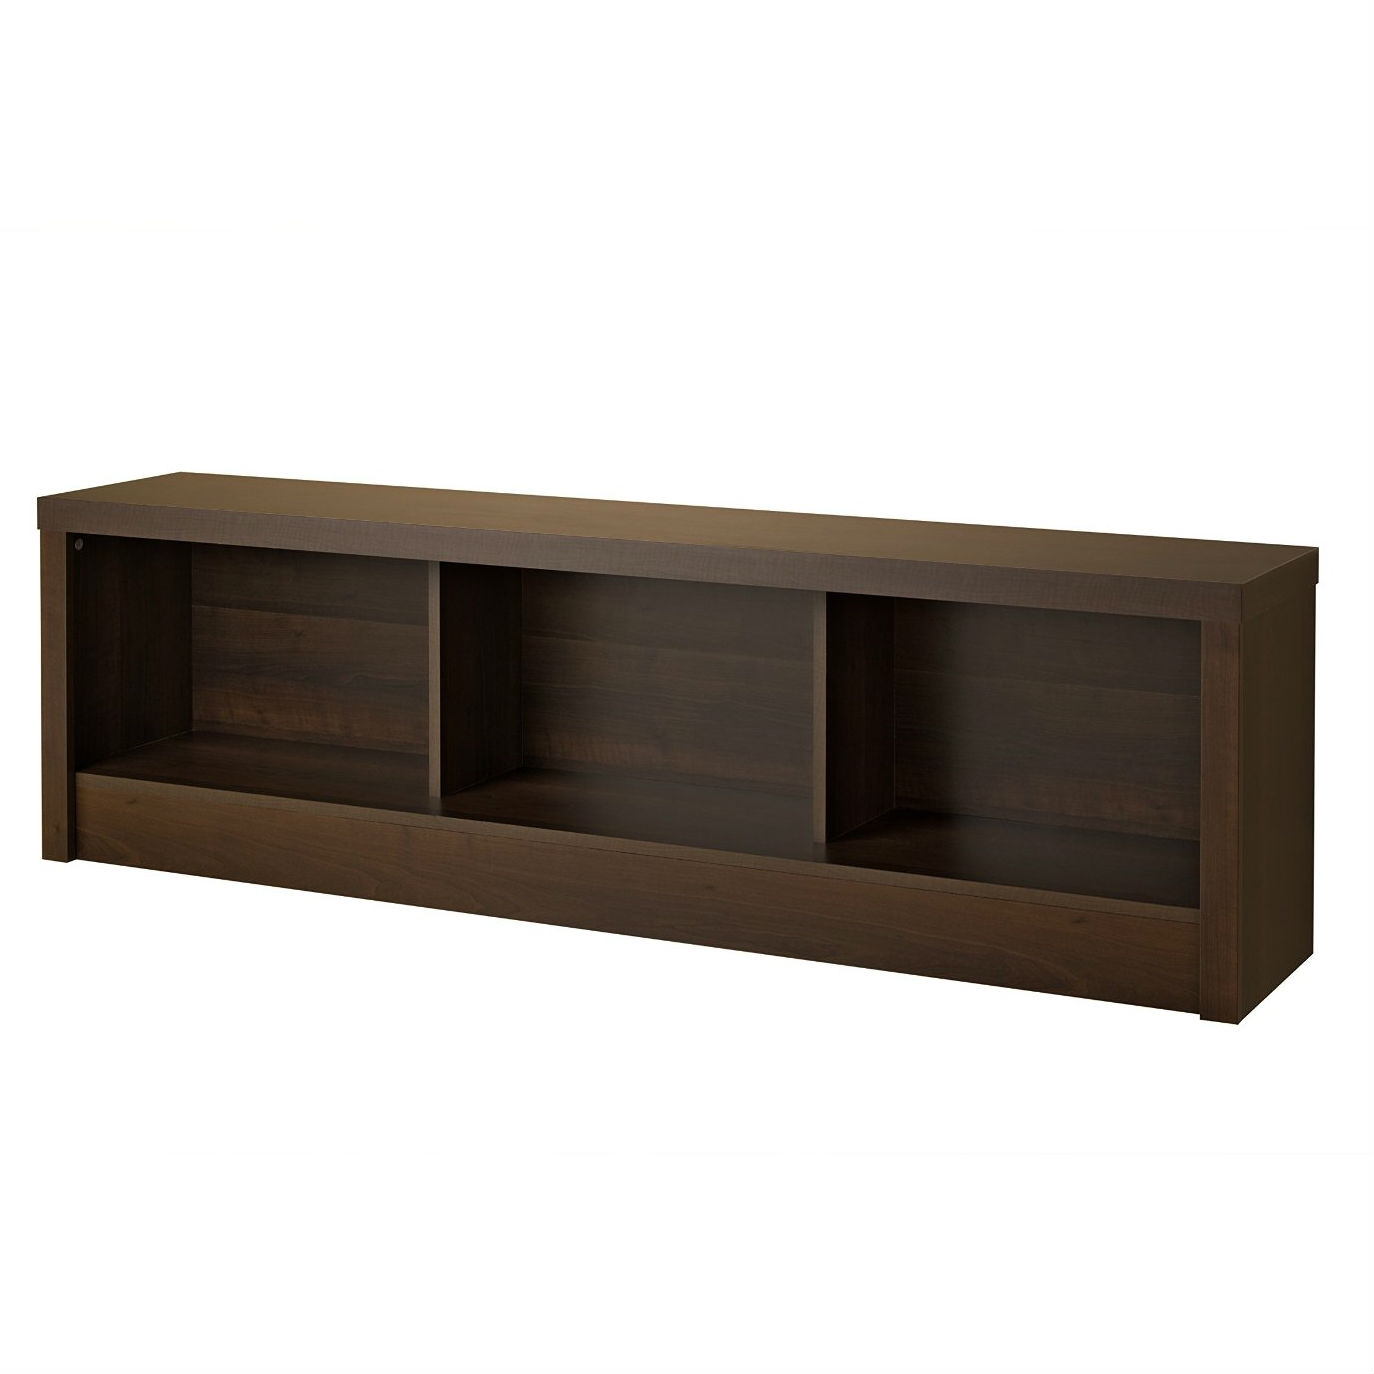 Bedroom Storage Bench Footboard in Espresso Wood Finish